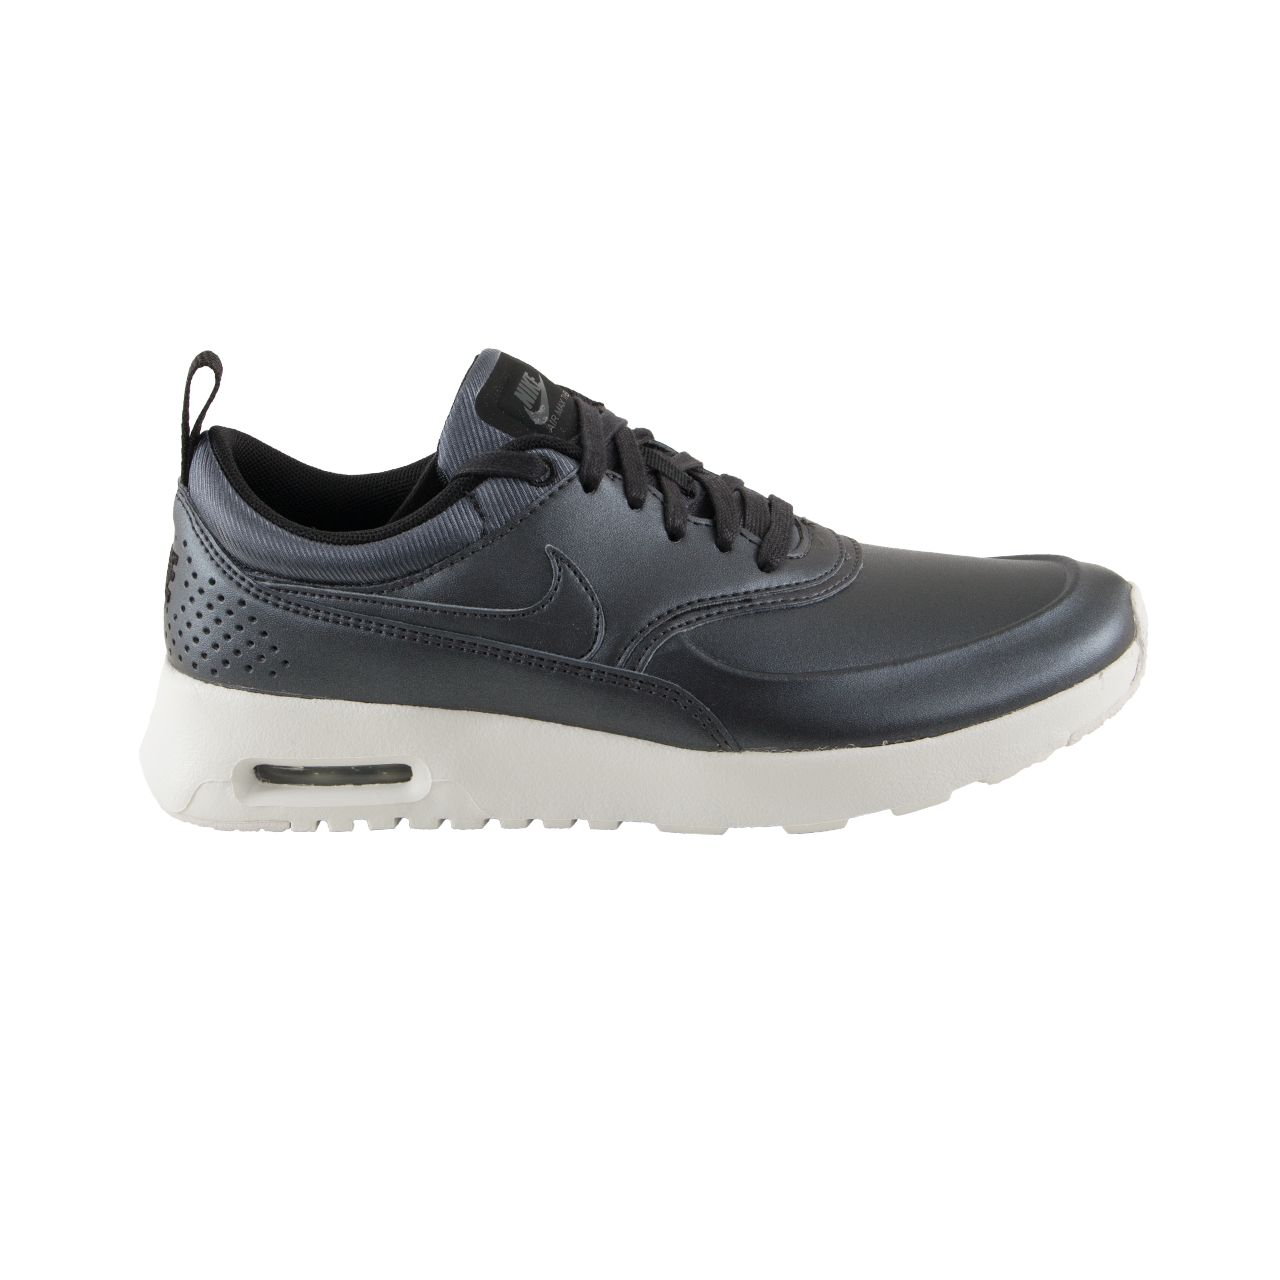 czech nike wmns air max thea prm sneakers dames 7bf31 92077